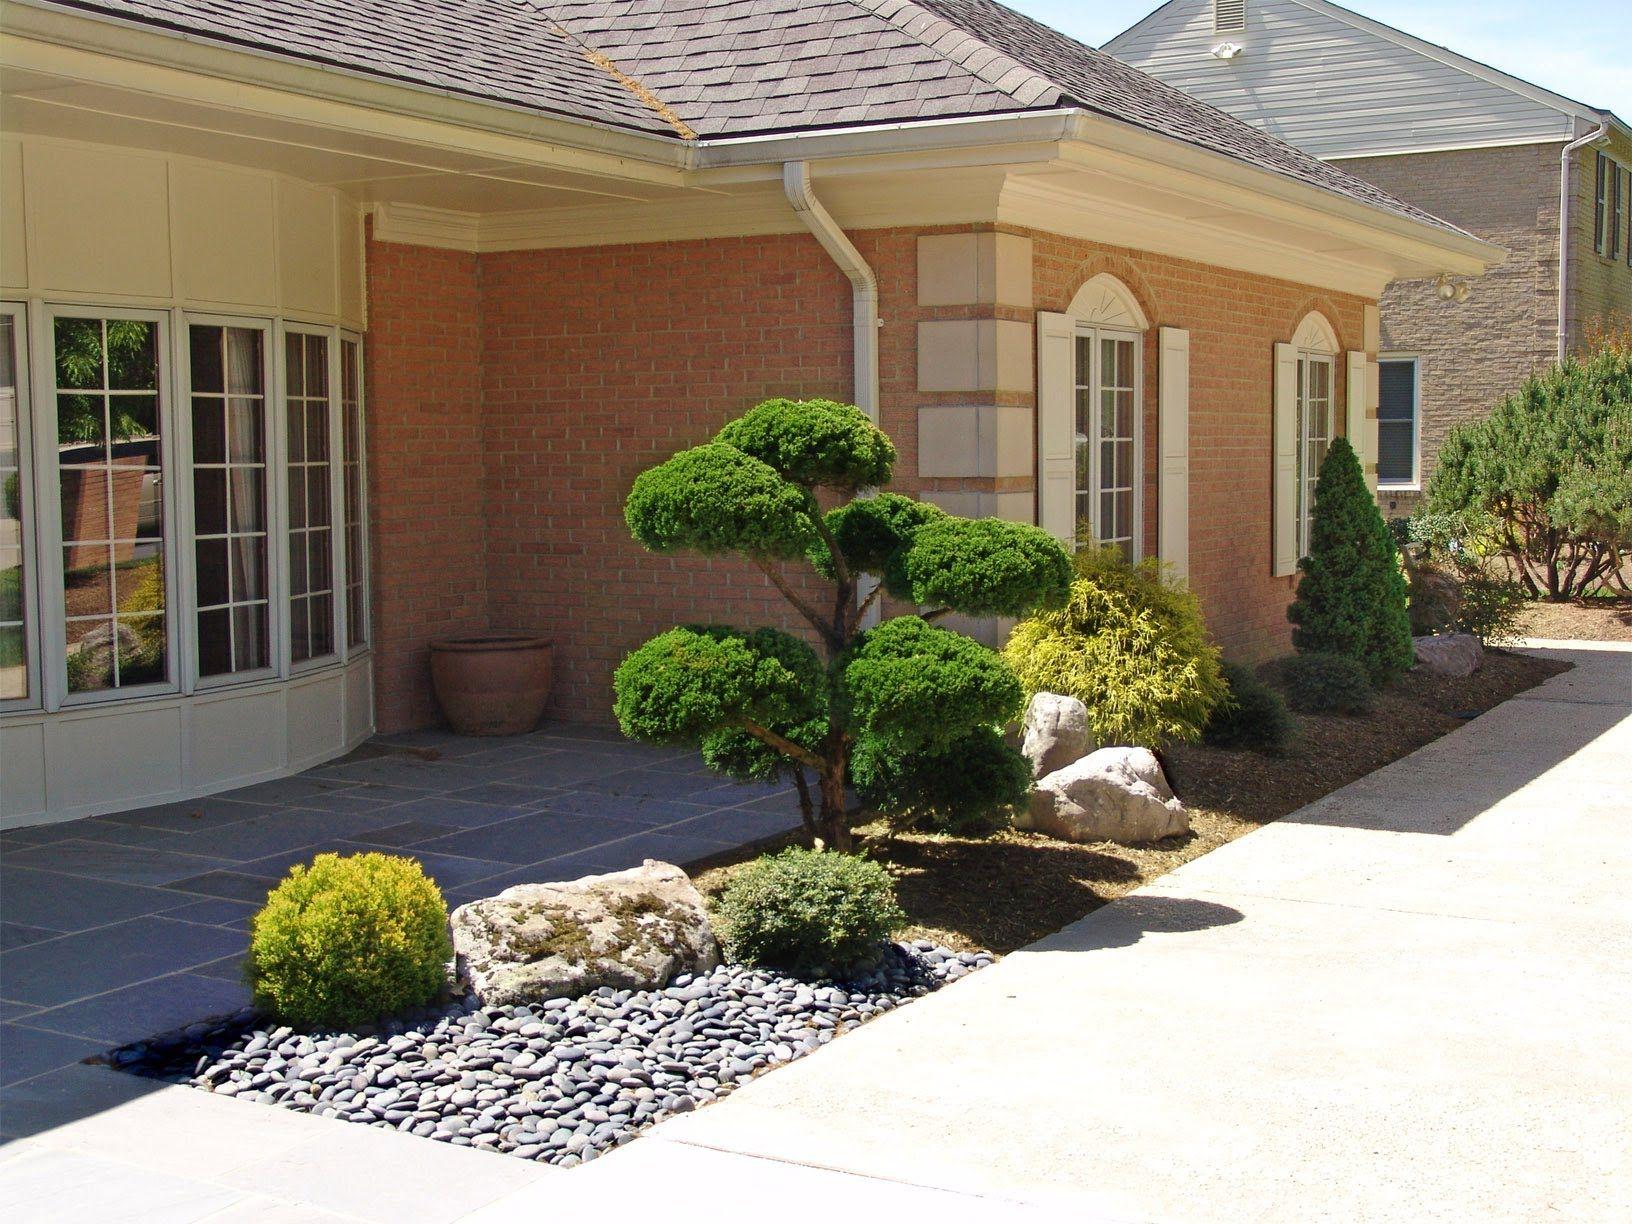 Marvelous Japanese Landscaping Ideas For Front Yard Part - 10: Front Entrance Landscape Design By Leeu0027s Oriental Landscape Art